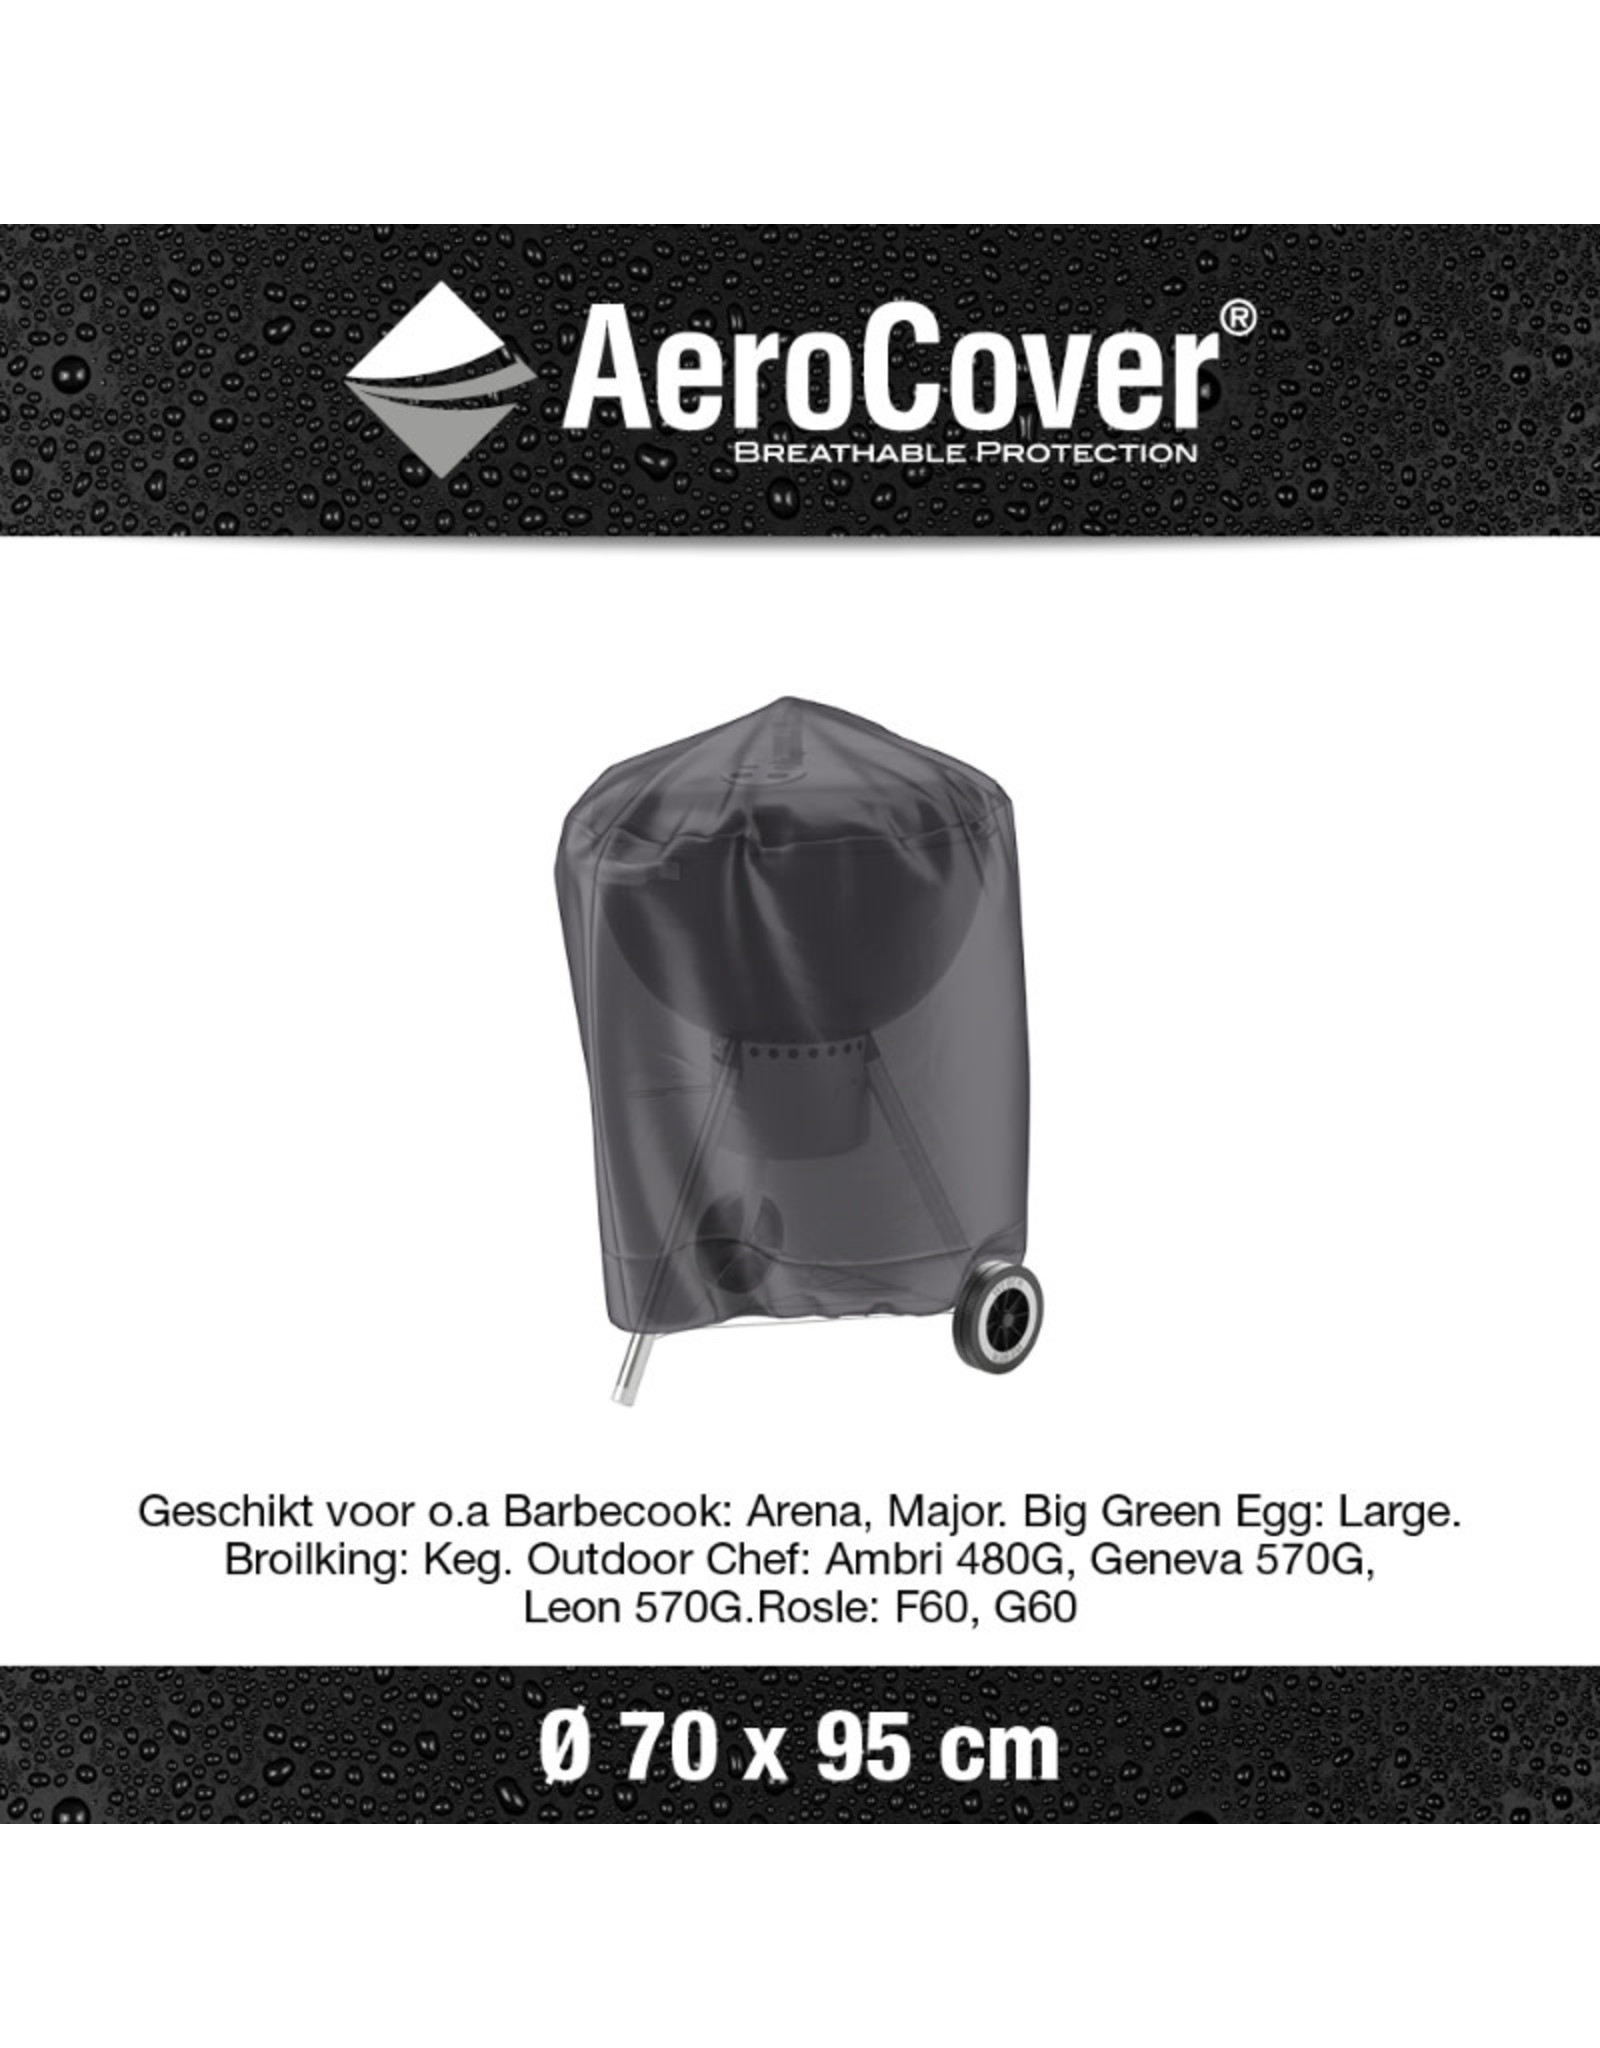 Aerocover AeroCover Bbq cover around 70cm